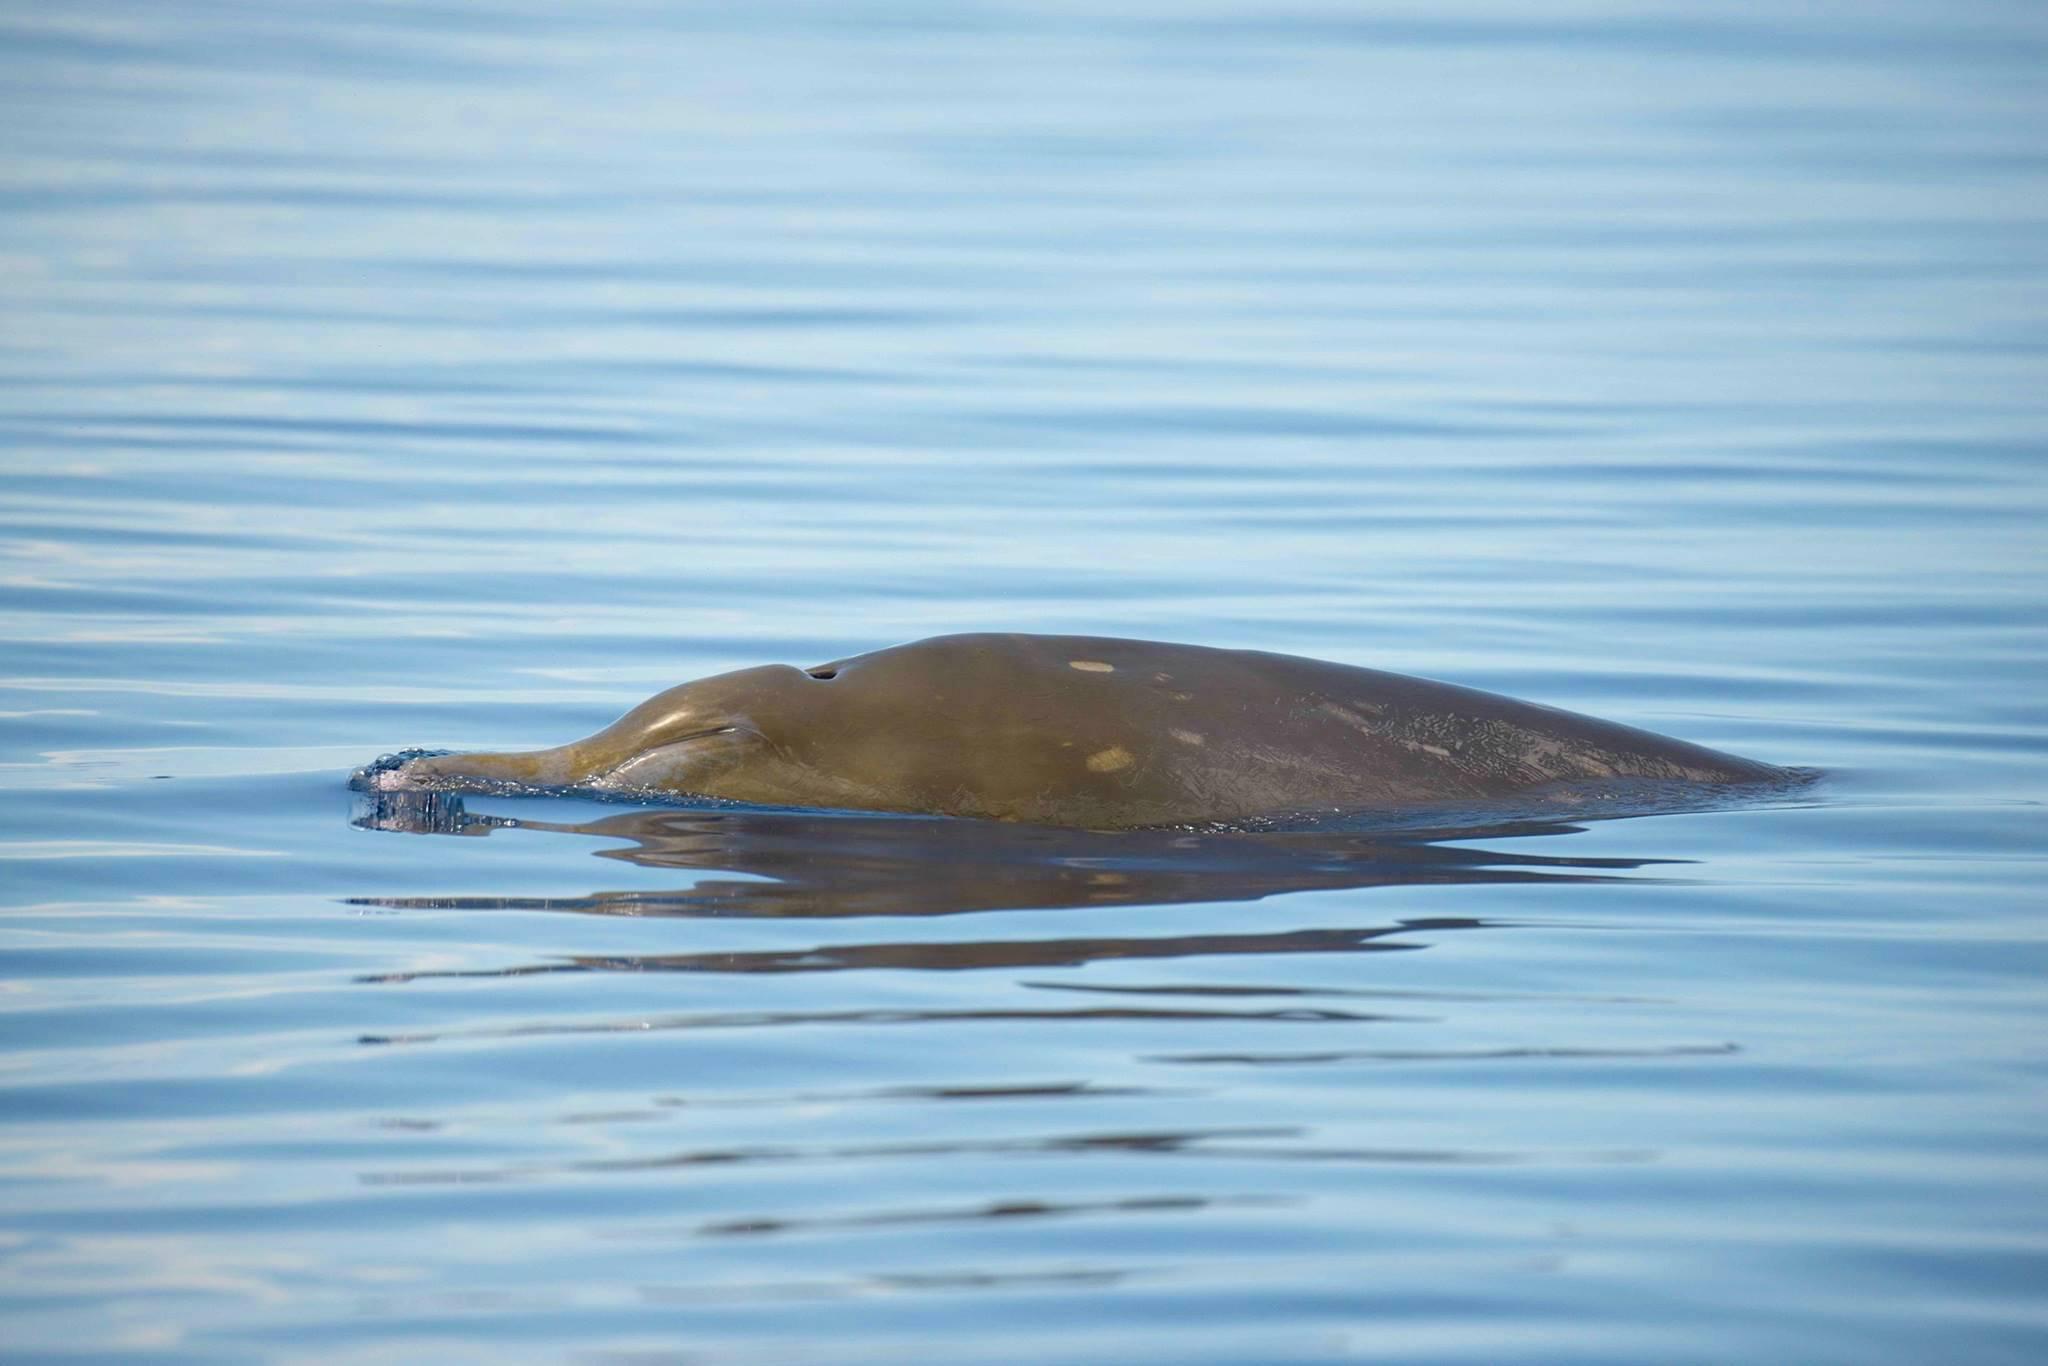 Blainville's Beaked Whale, Abaco (BMMRO)